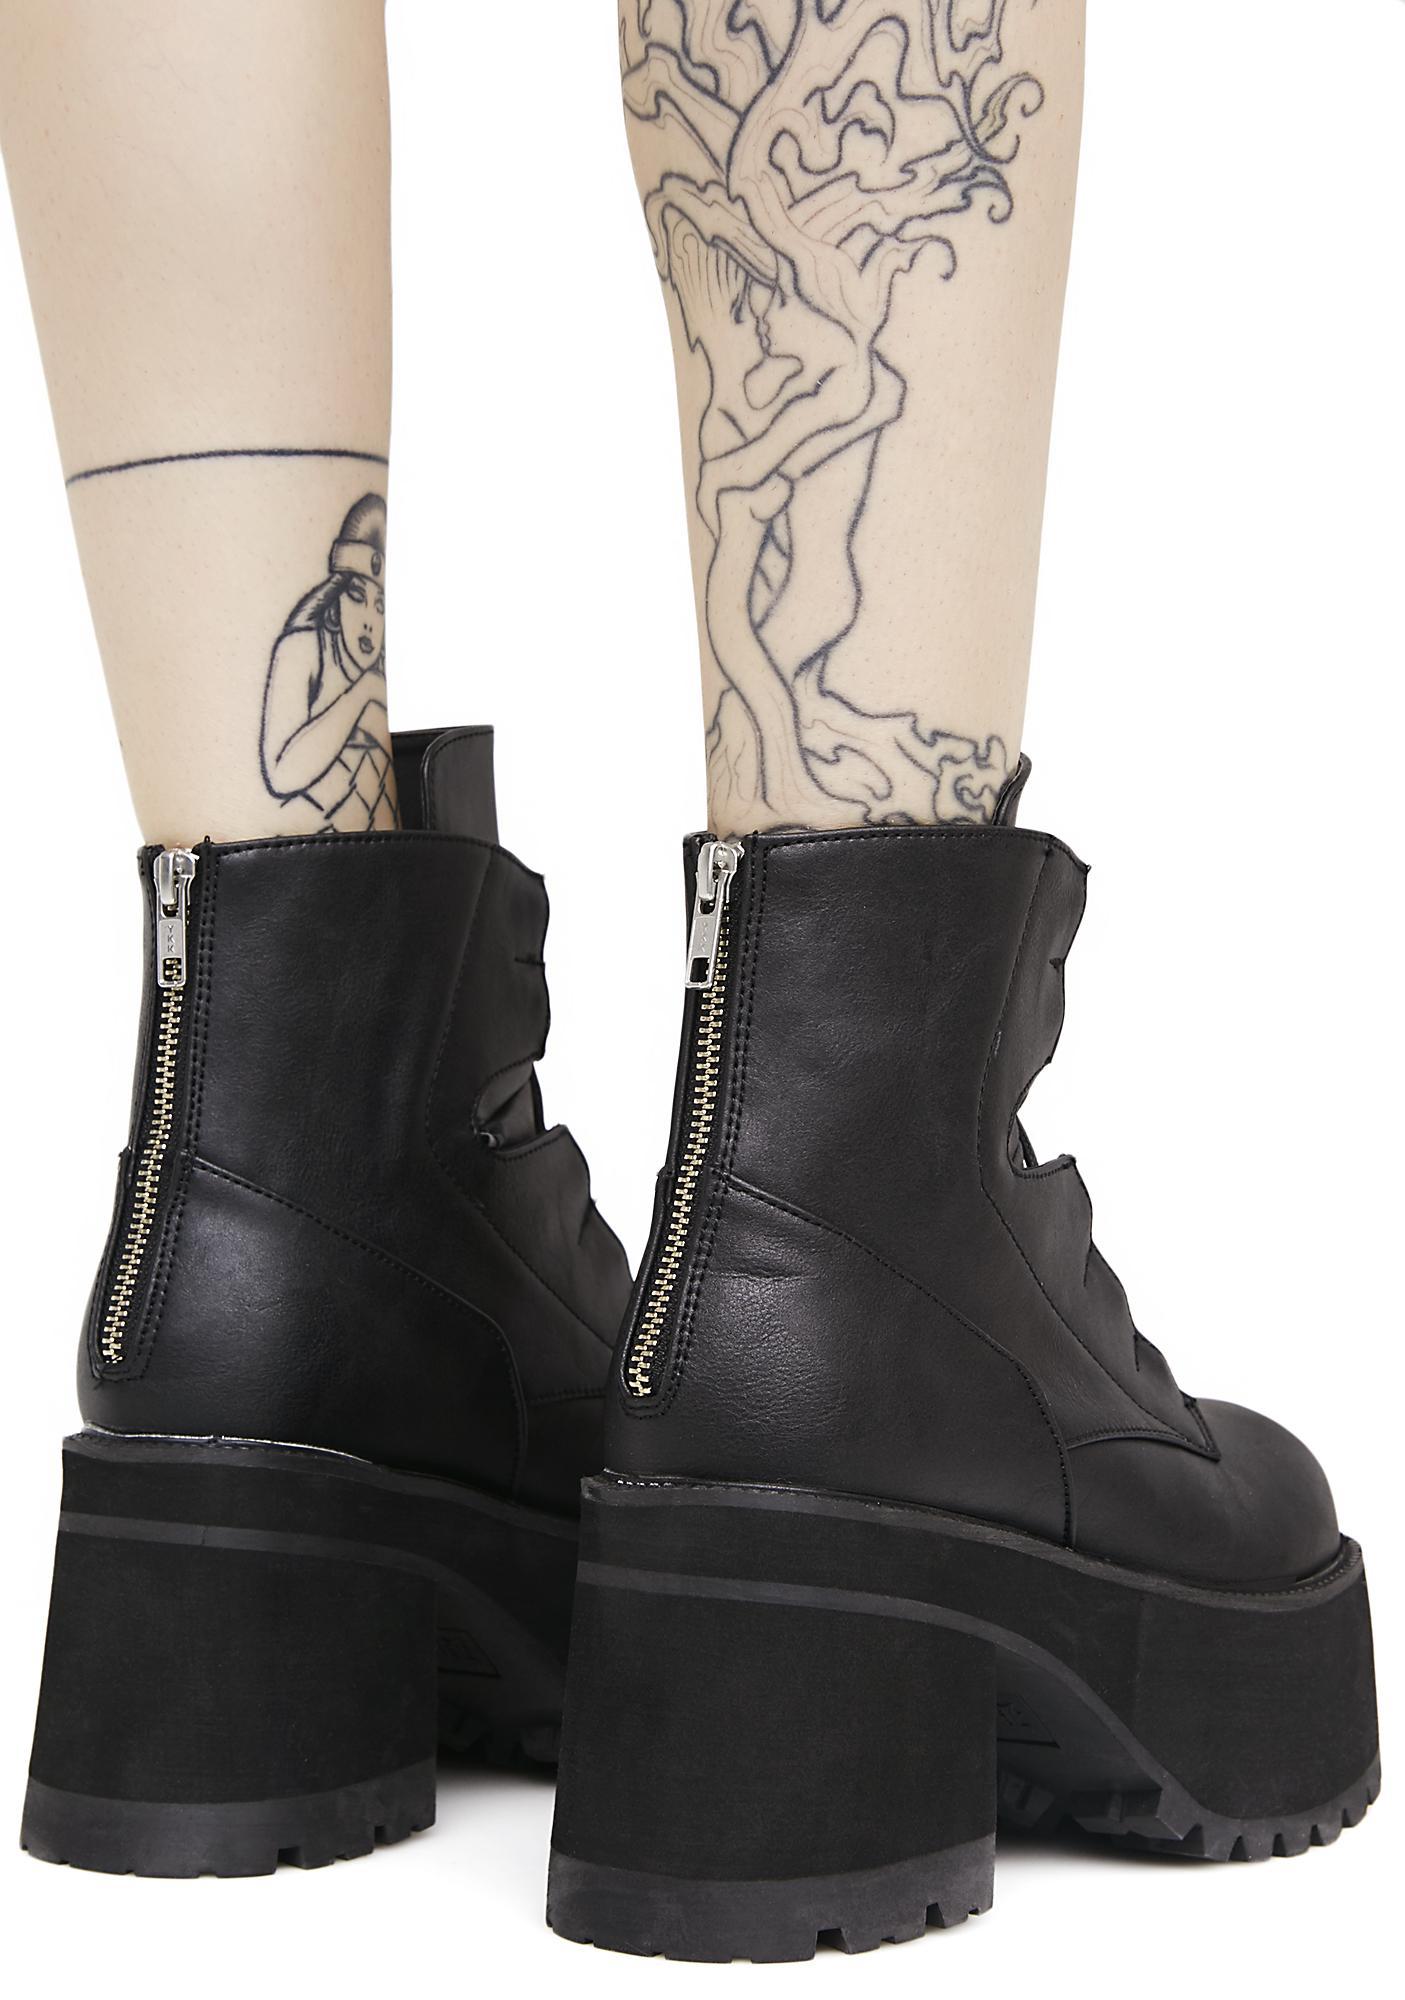 Demonia Earthshatter Platform Boots